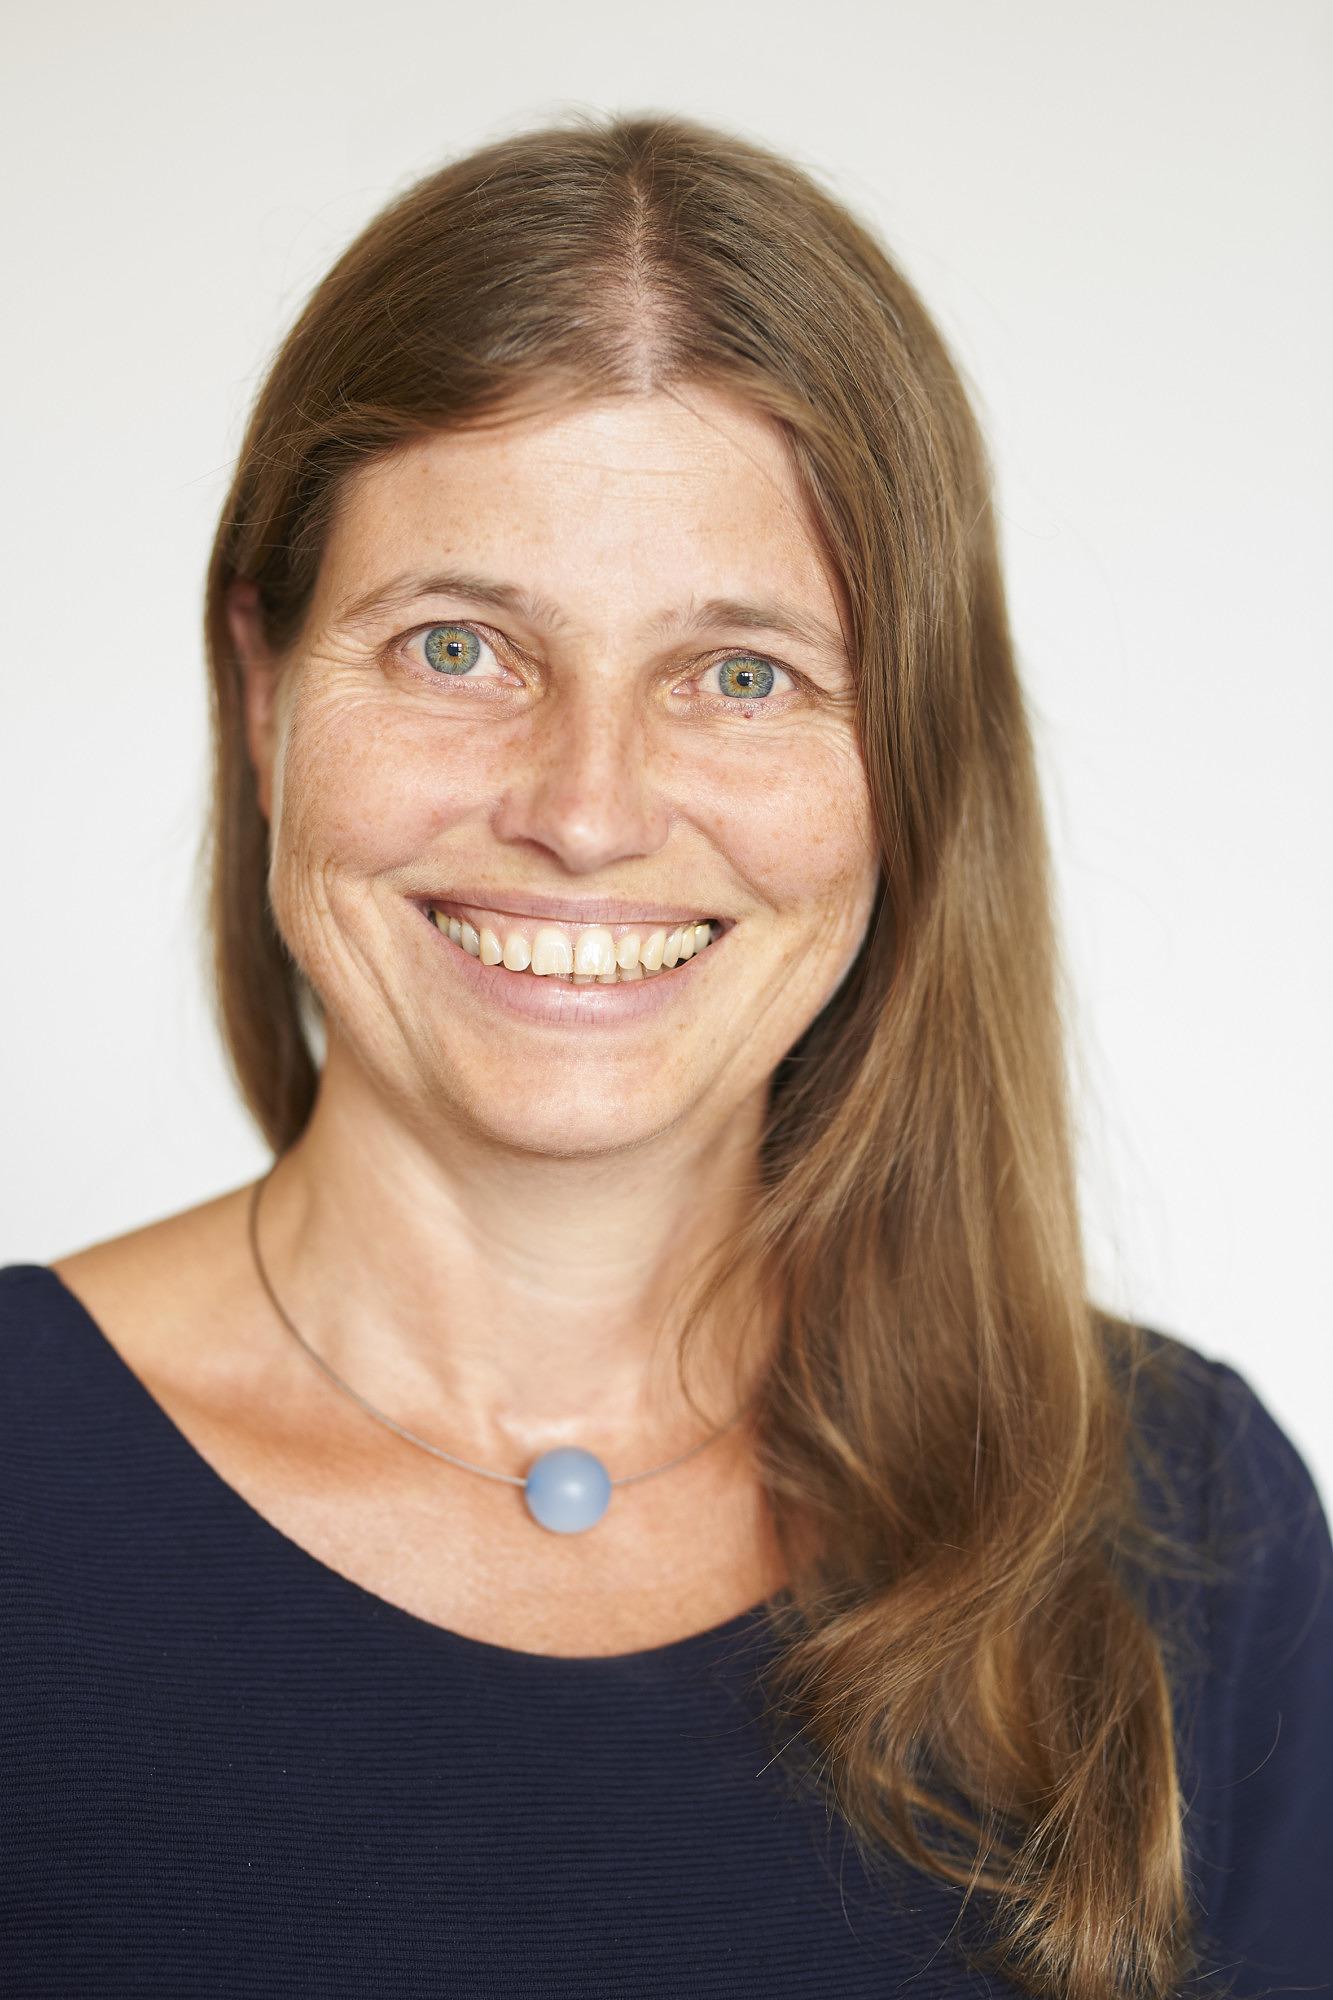 Anja Bosserhoff